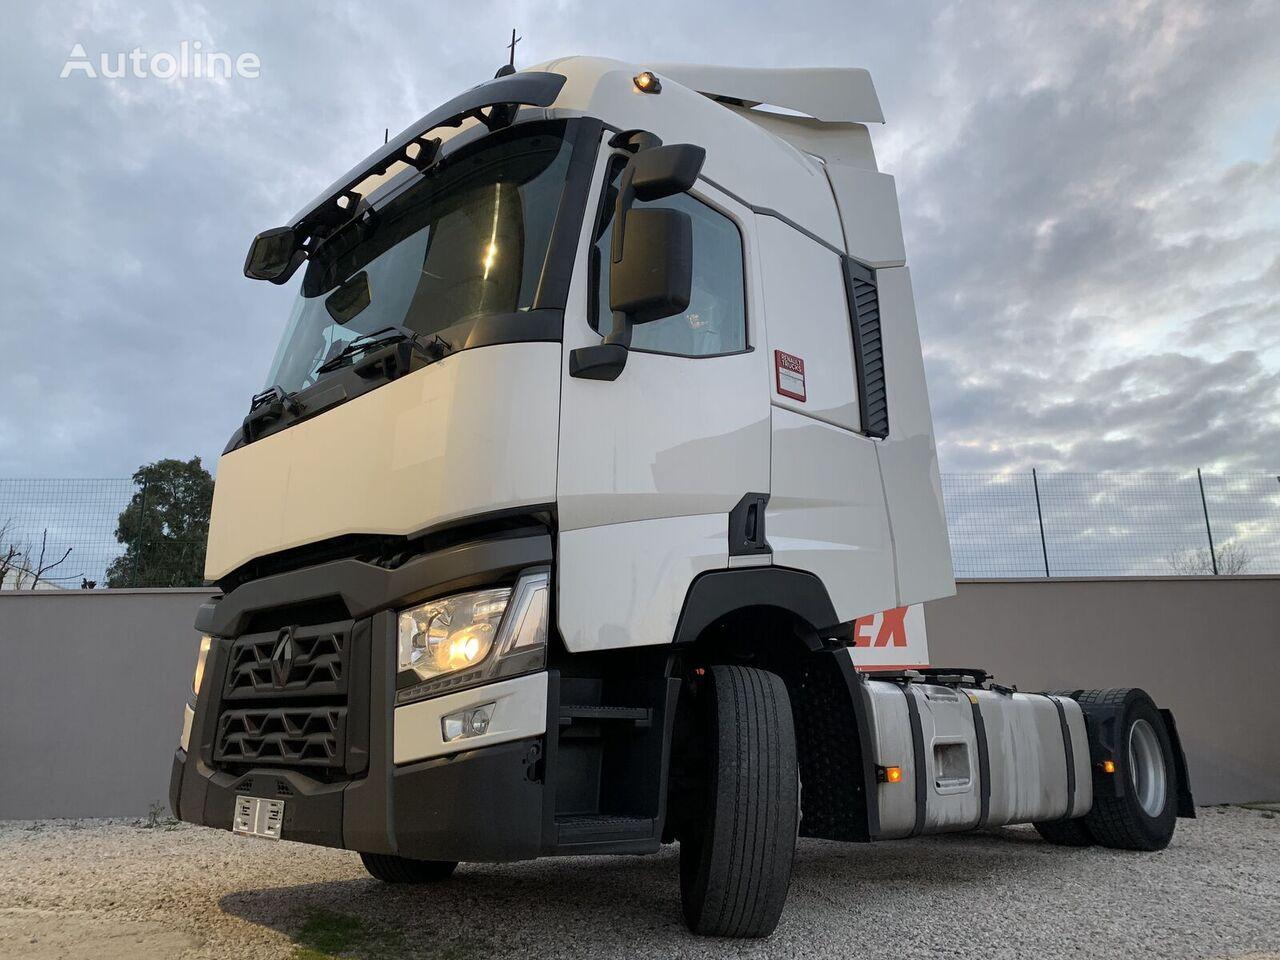 RENAULT 2017 -T 440 Comfort - Km 480.000 motore Volvo 12777 cc, 450 CV tractora